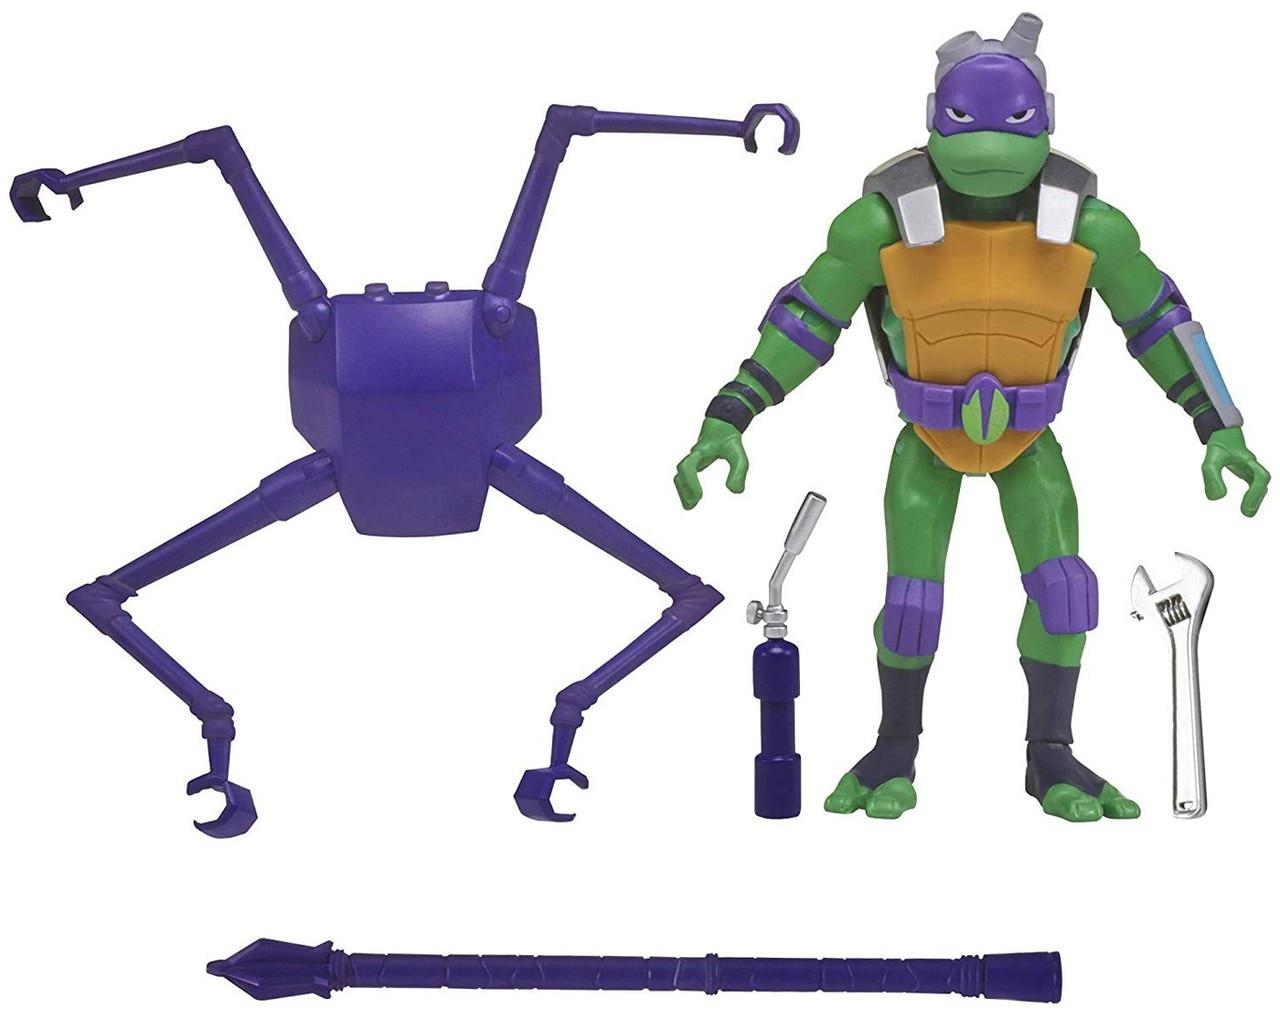 Rise of the Teenage Mutant Ninja Turtles - Battle Shell Action Figure - Donatello